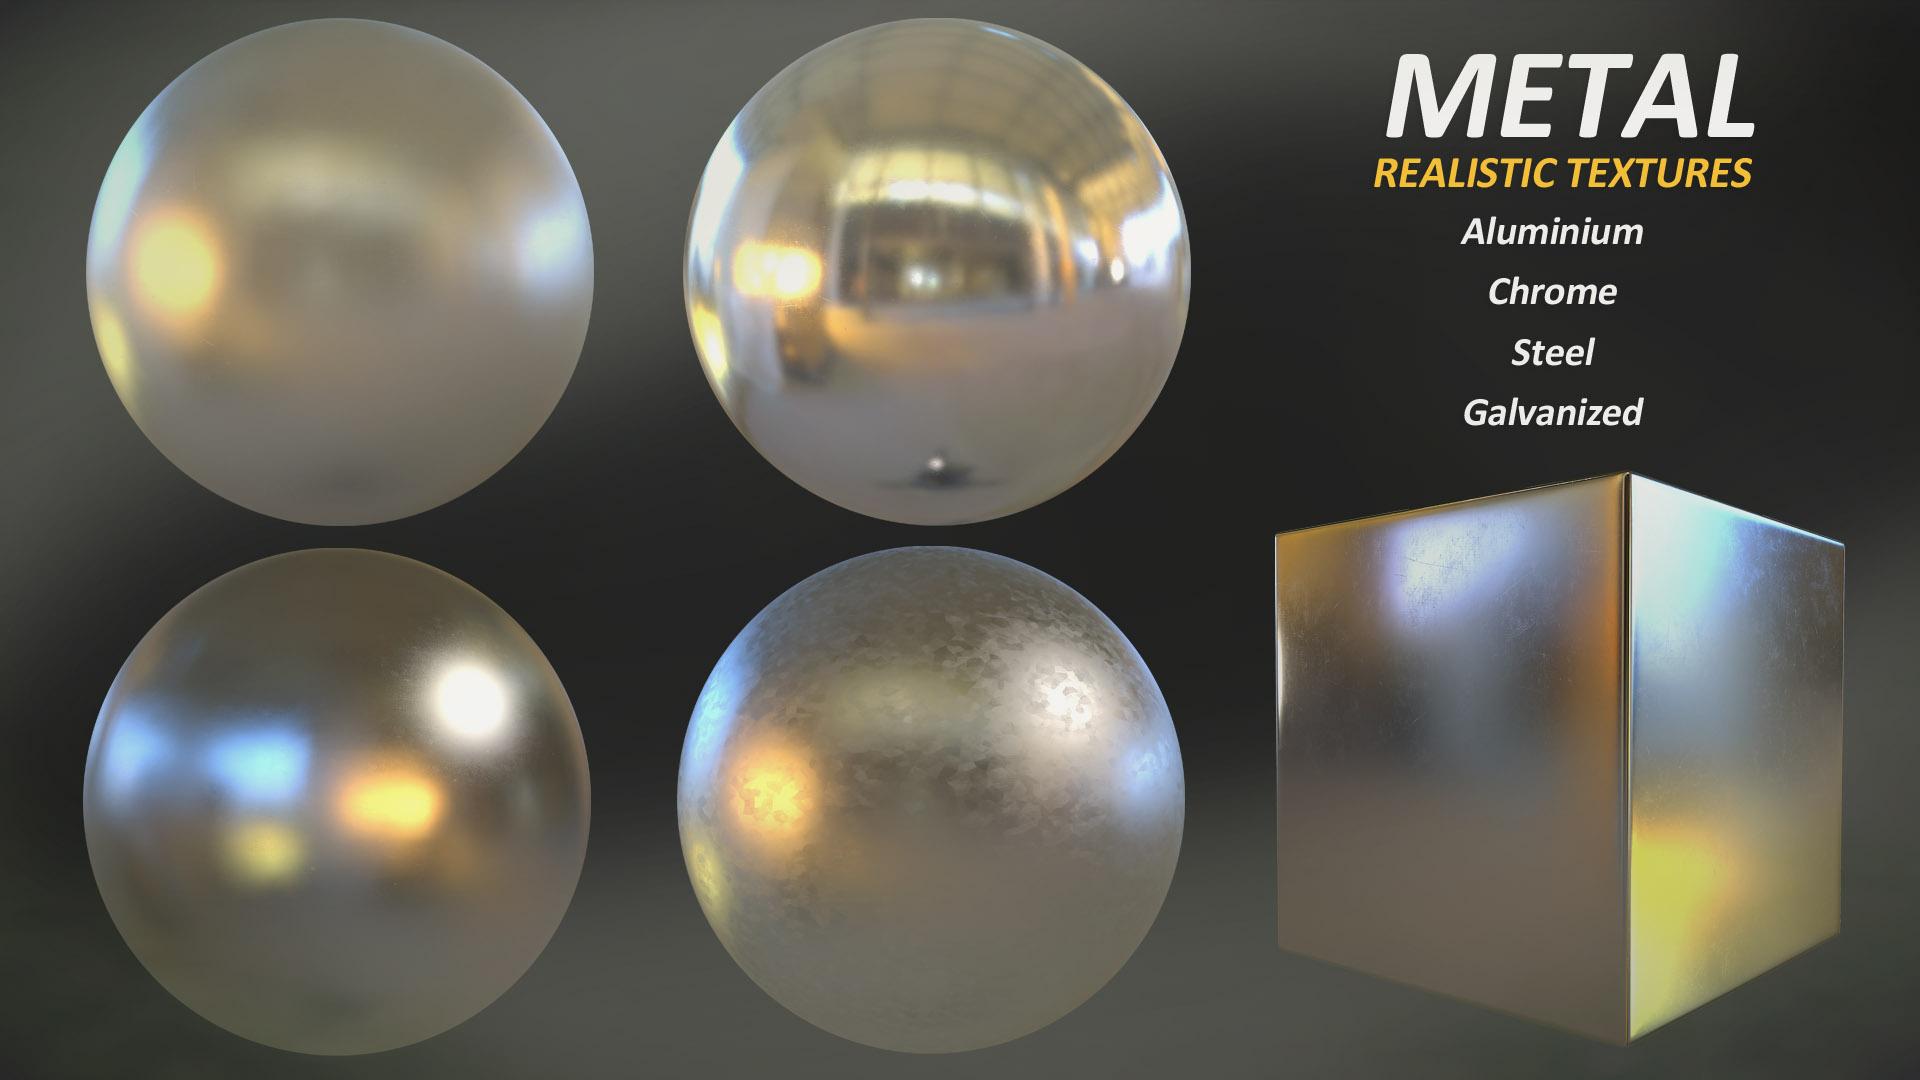 metal_realistic_textures_02.jpg